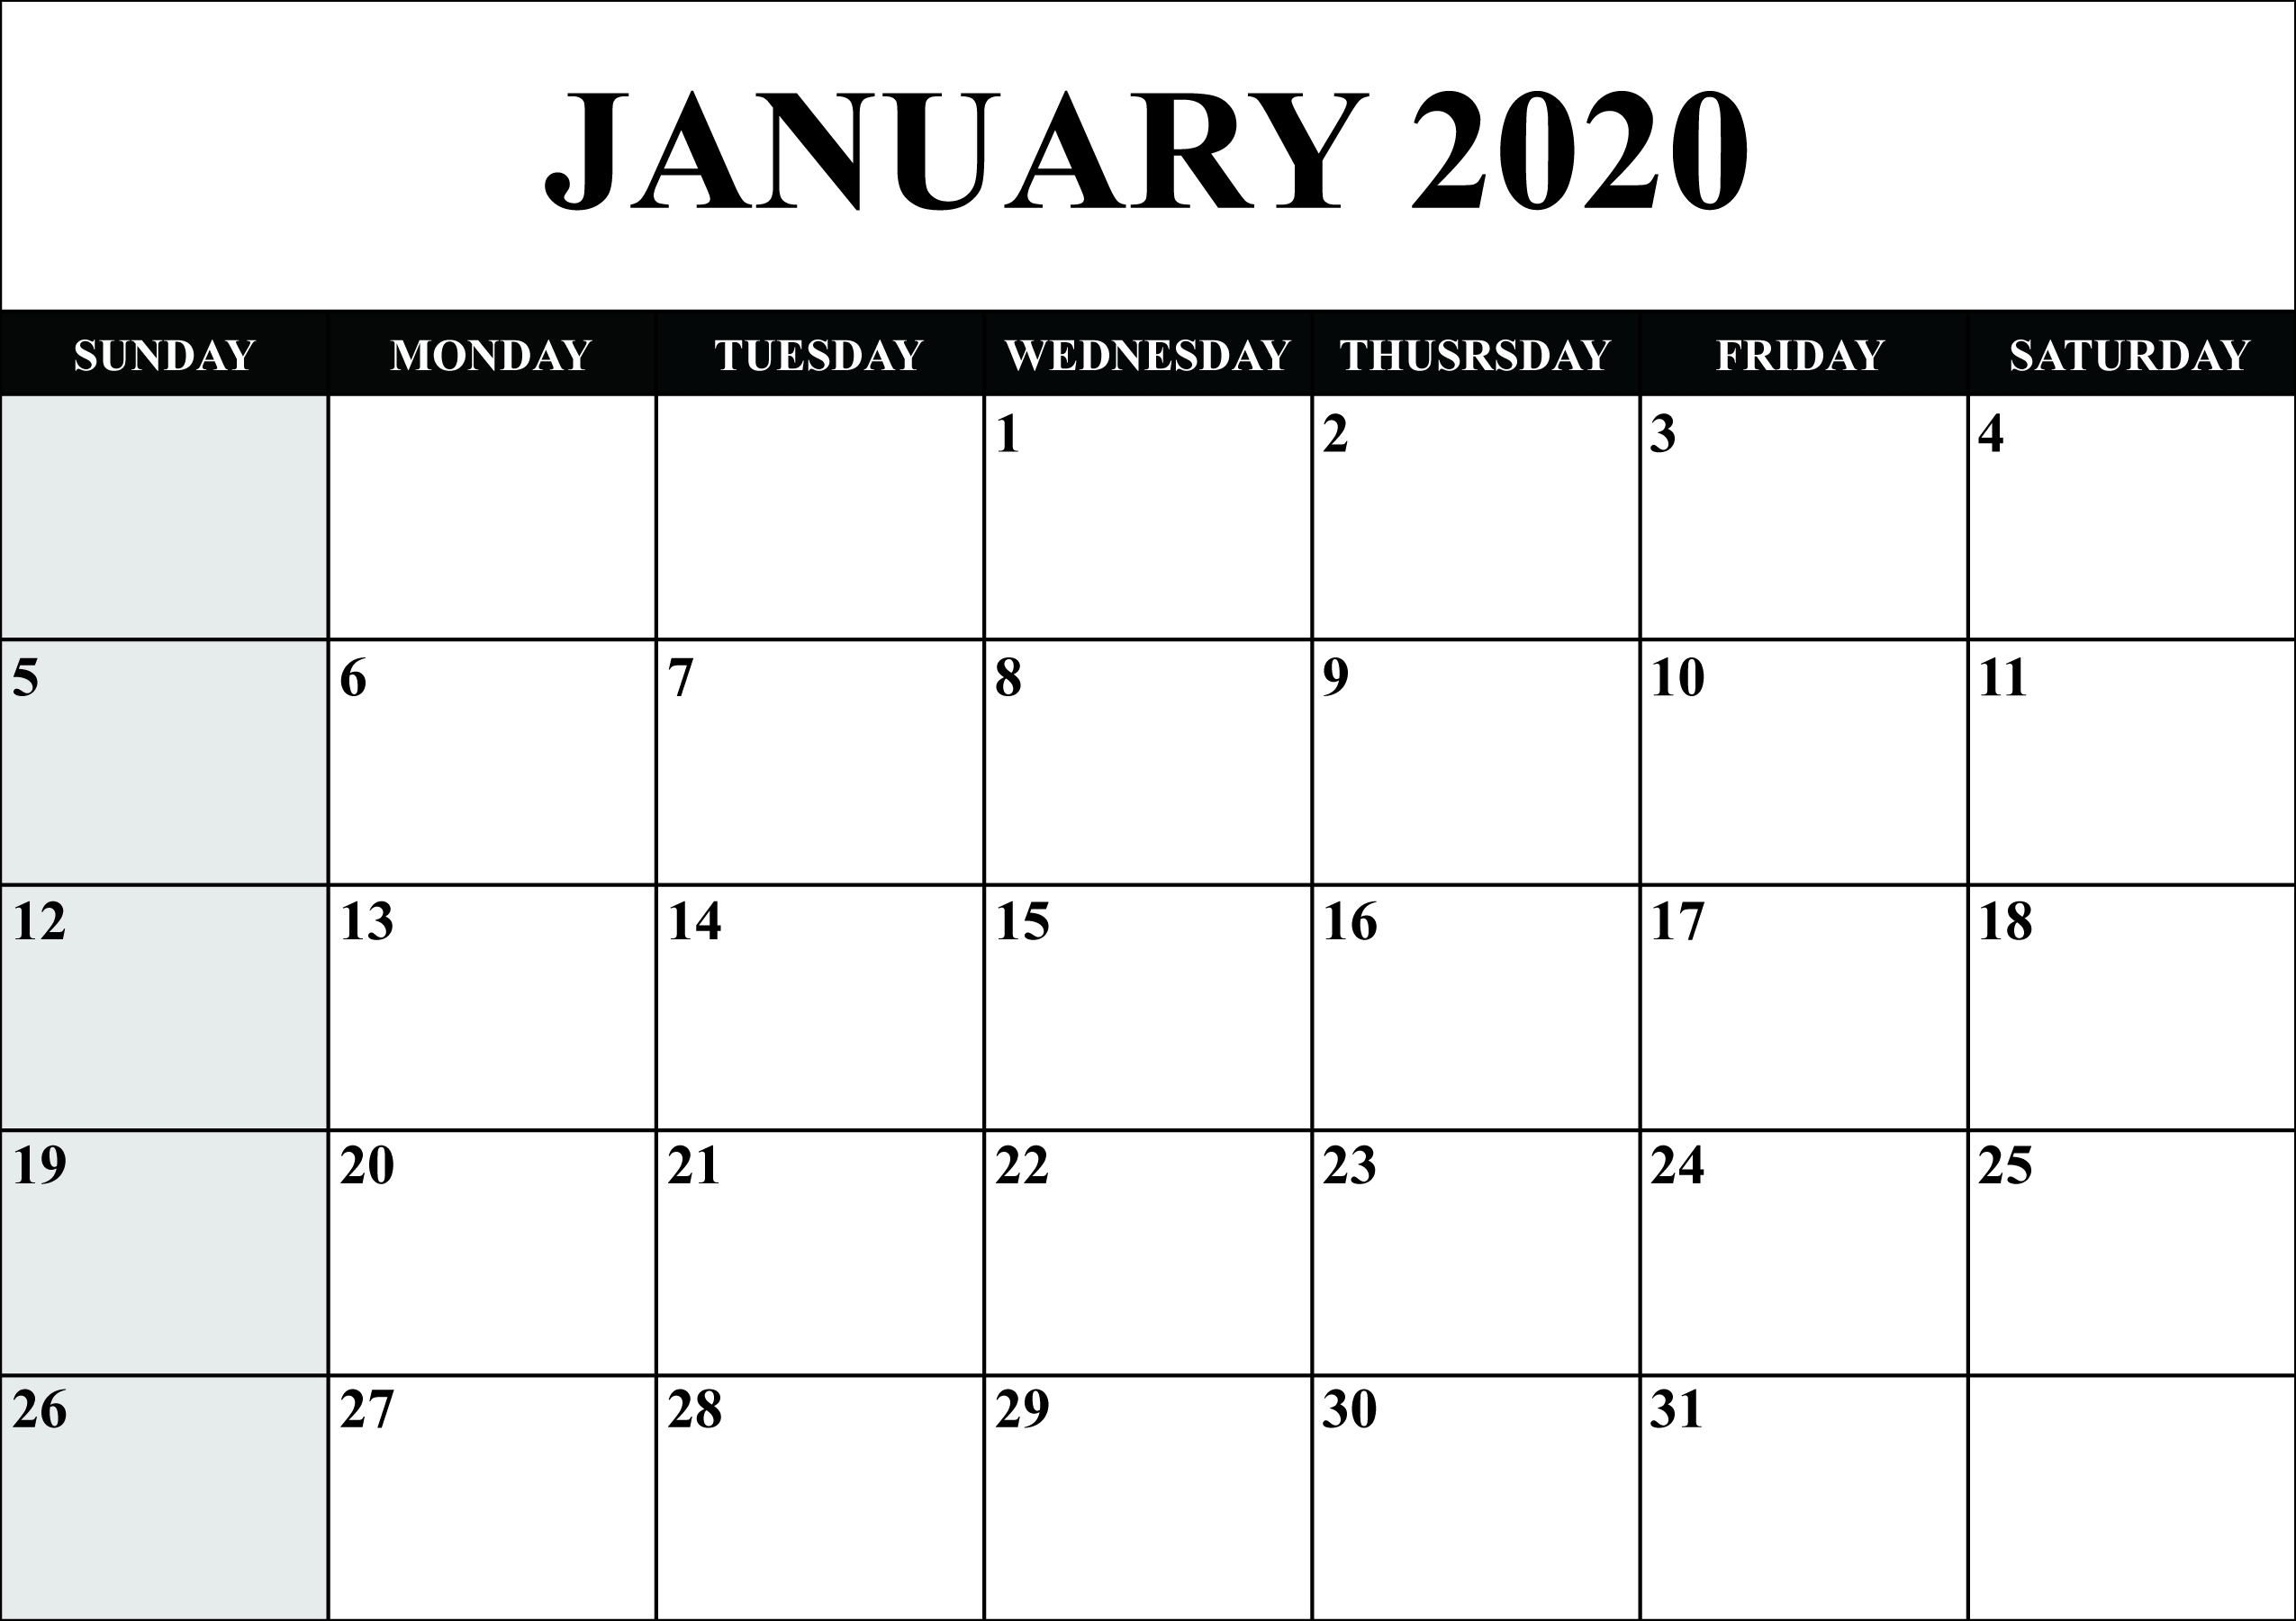 Free Blank January 2020 Calendar Printable In Pdf, Word